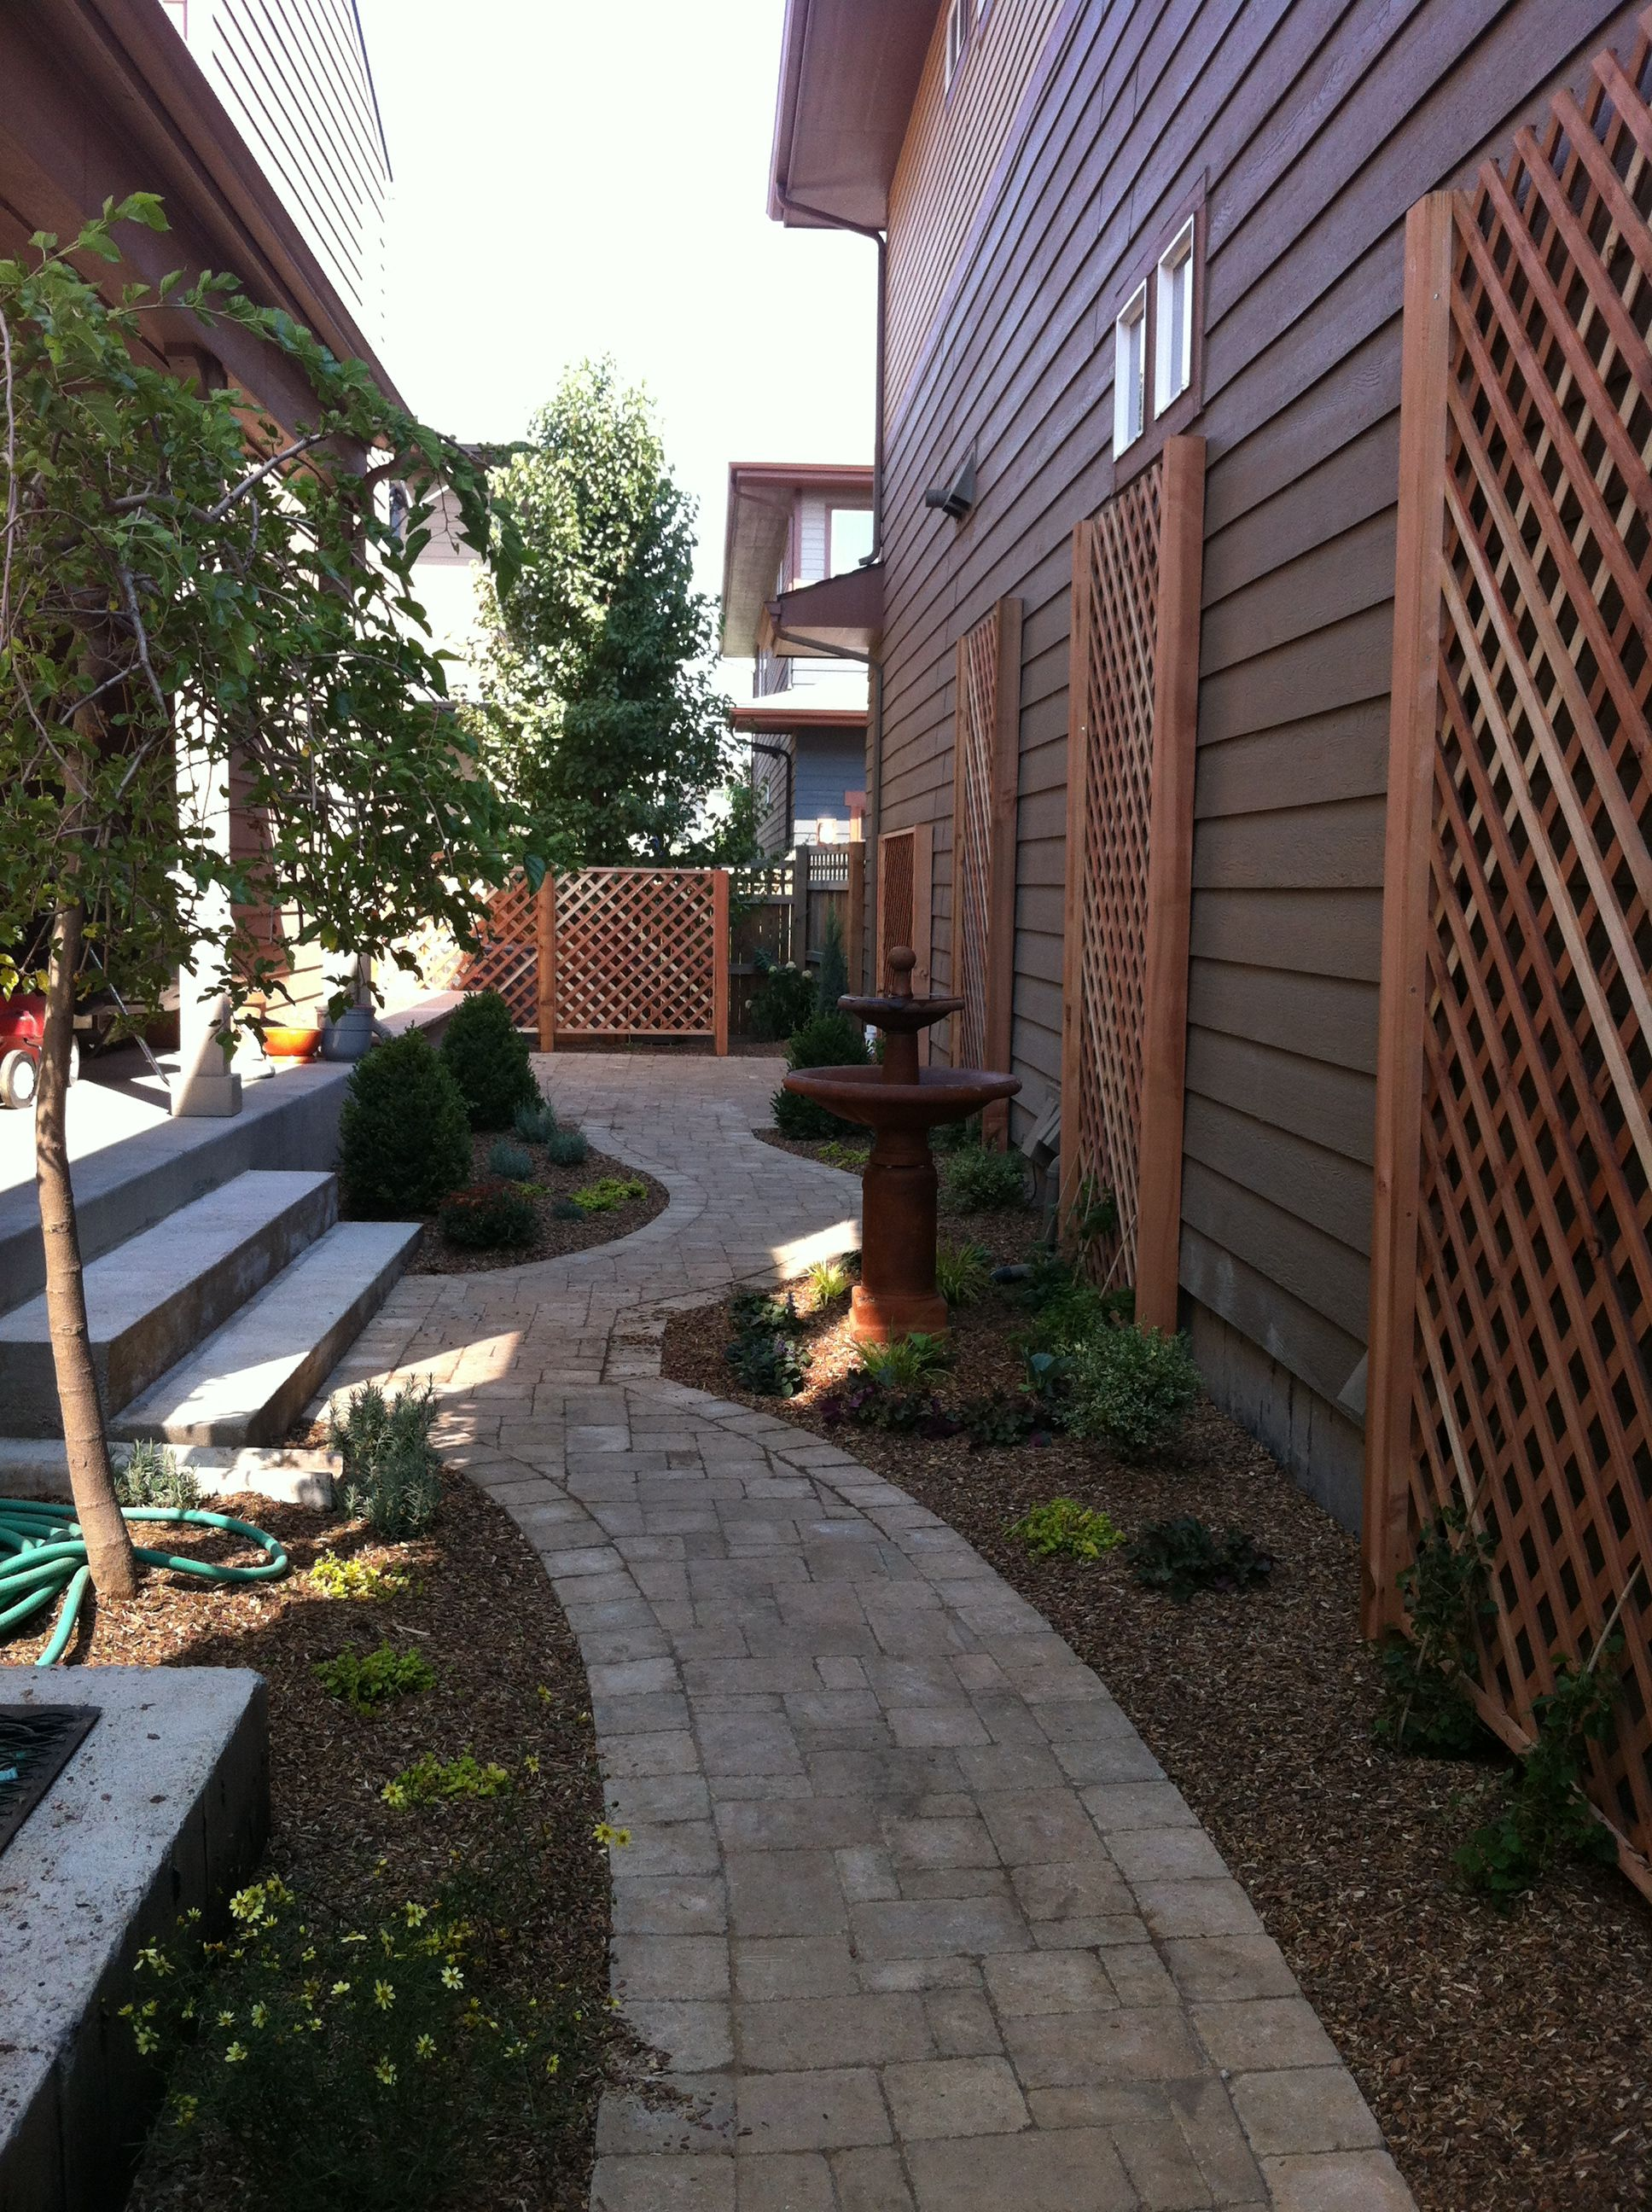 +76 Narrow Backyard Design Ideas | Home Decor on Side Yard Designs id=75099